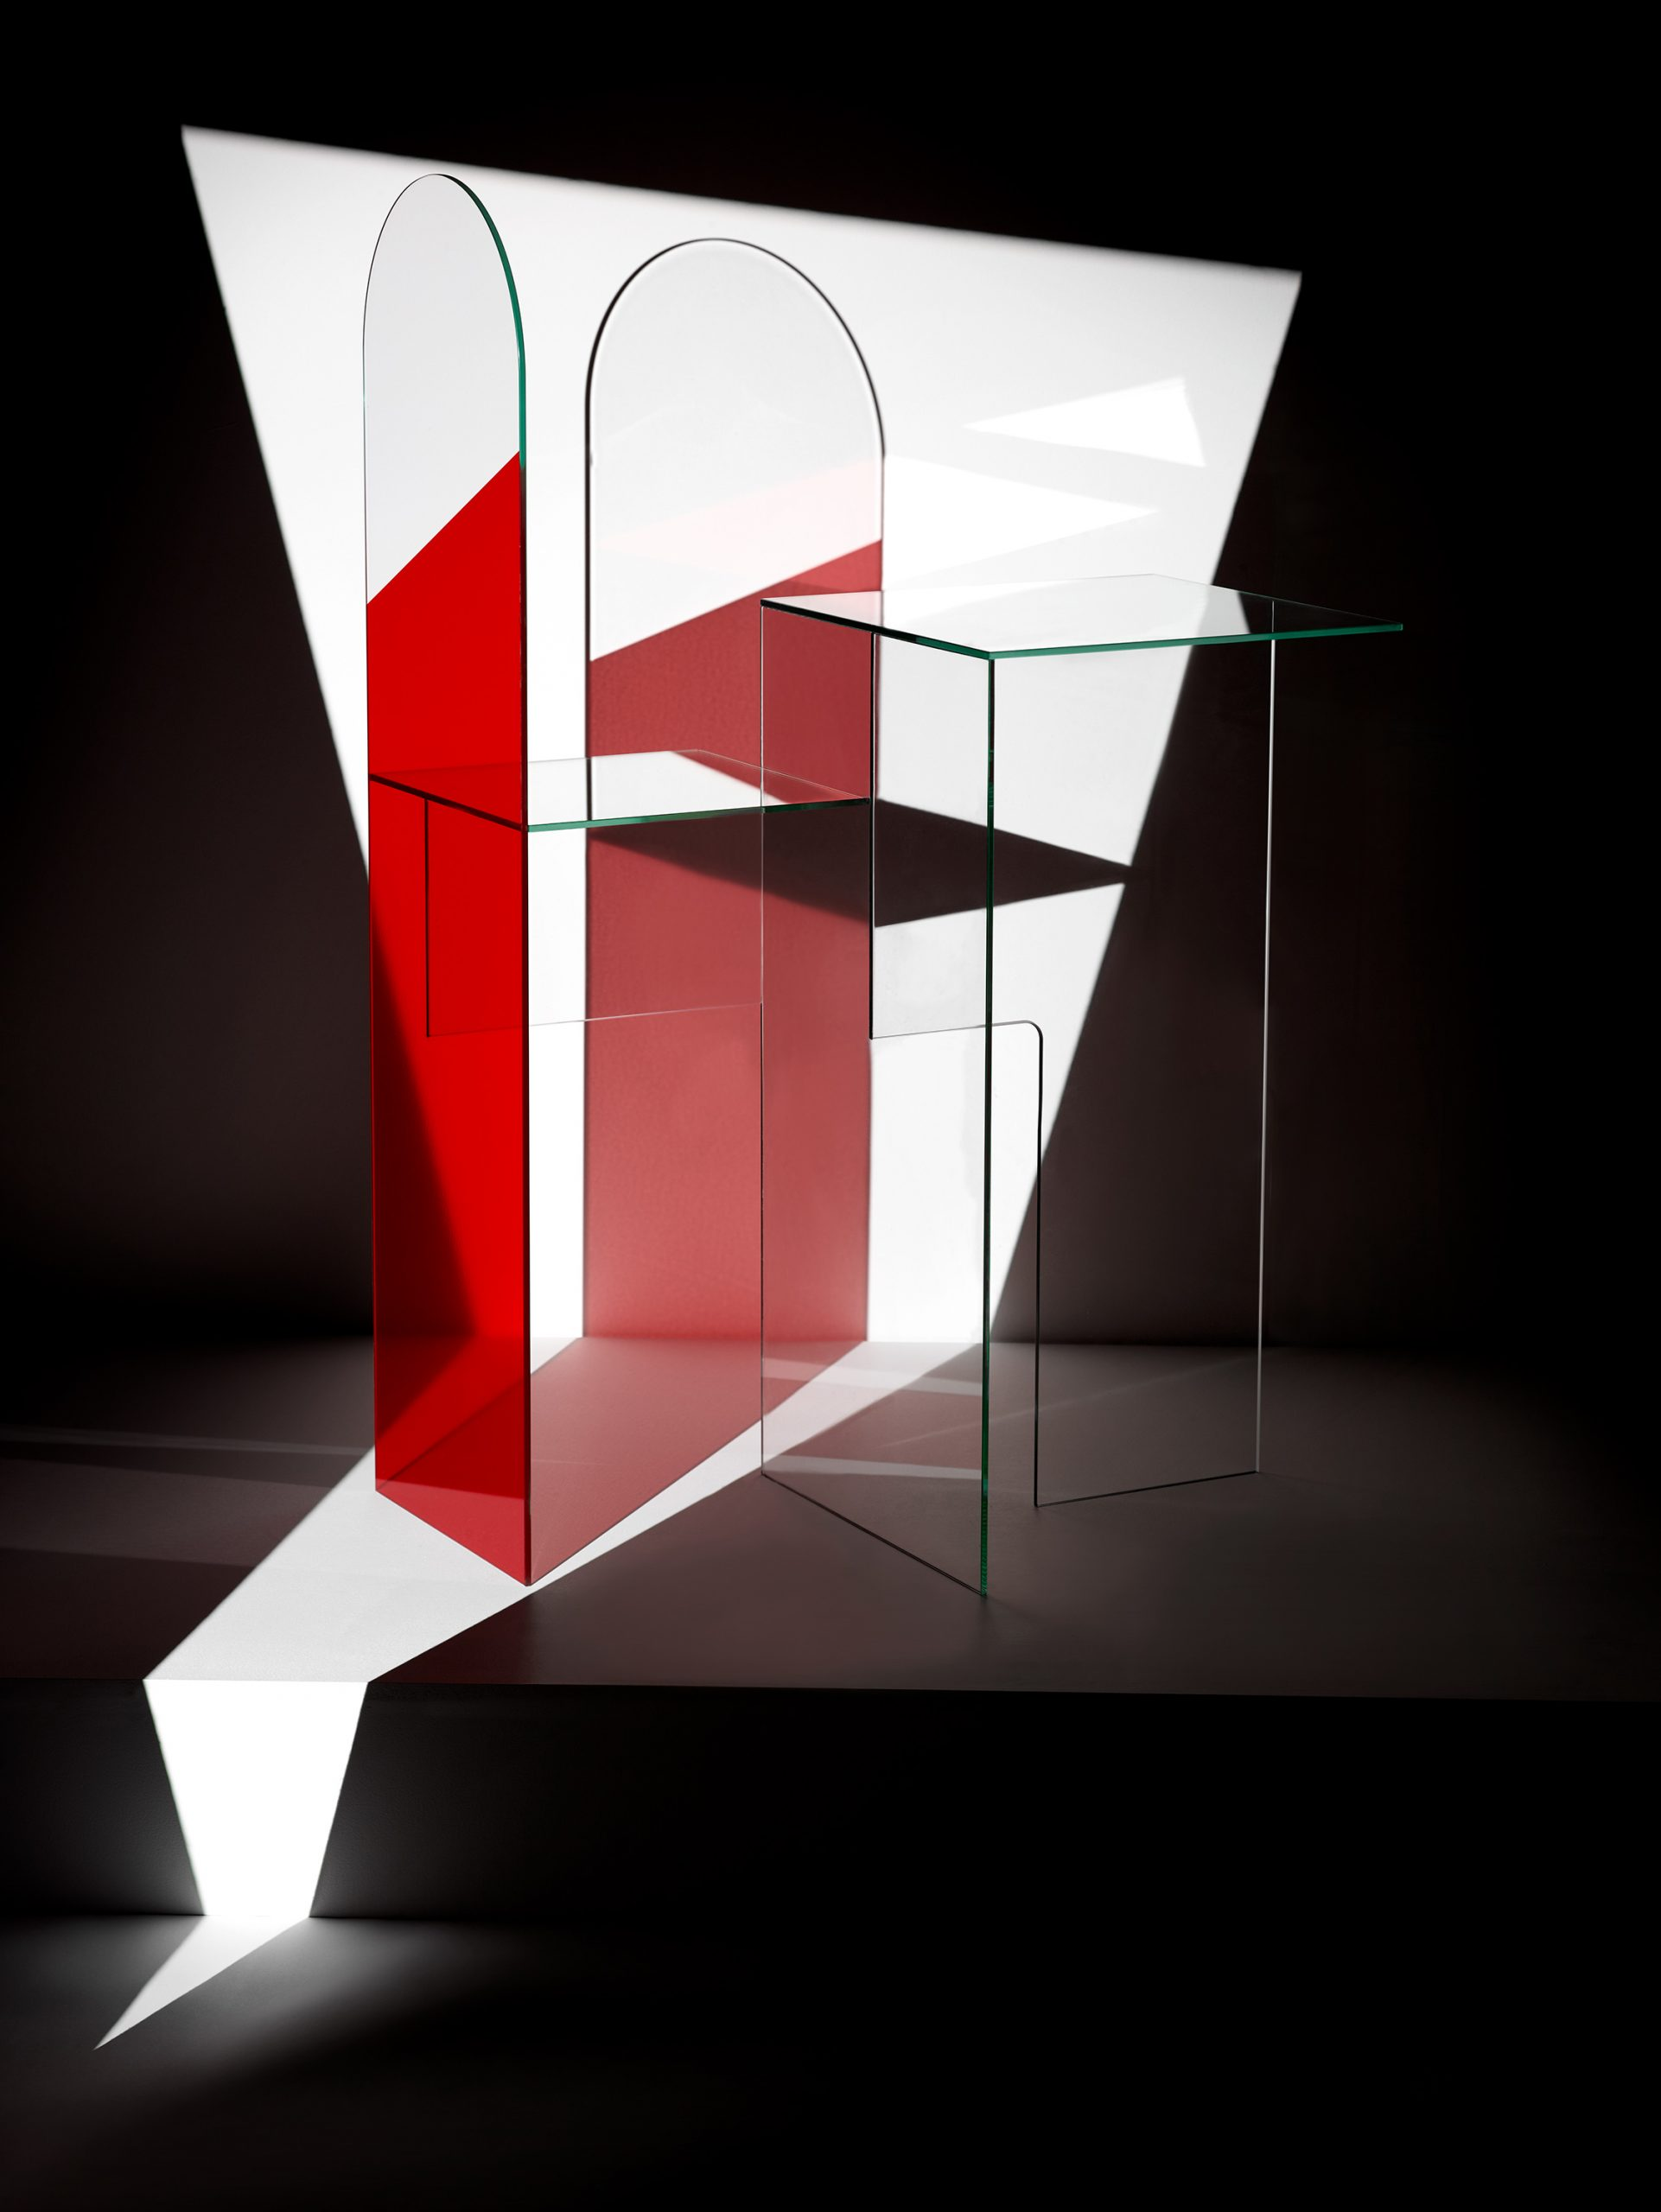 Wren-Agency-Richard-Foster-Overview-18